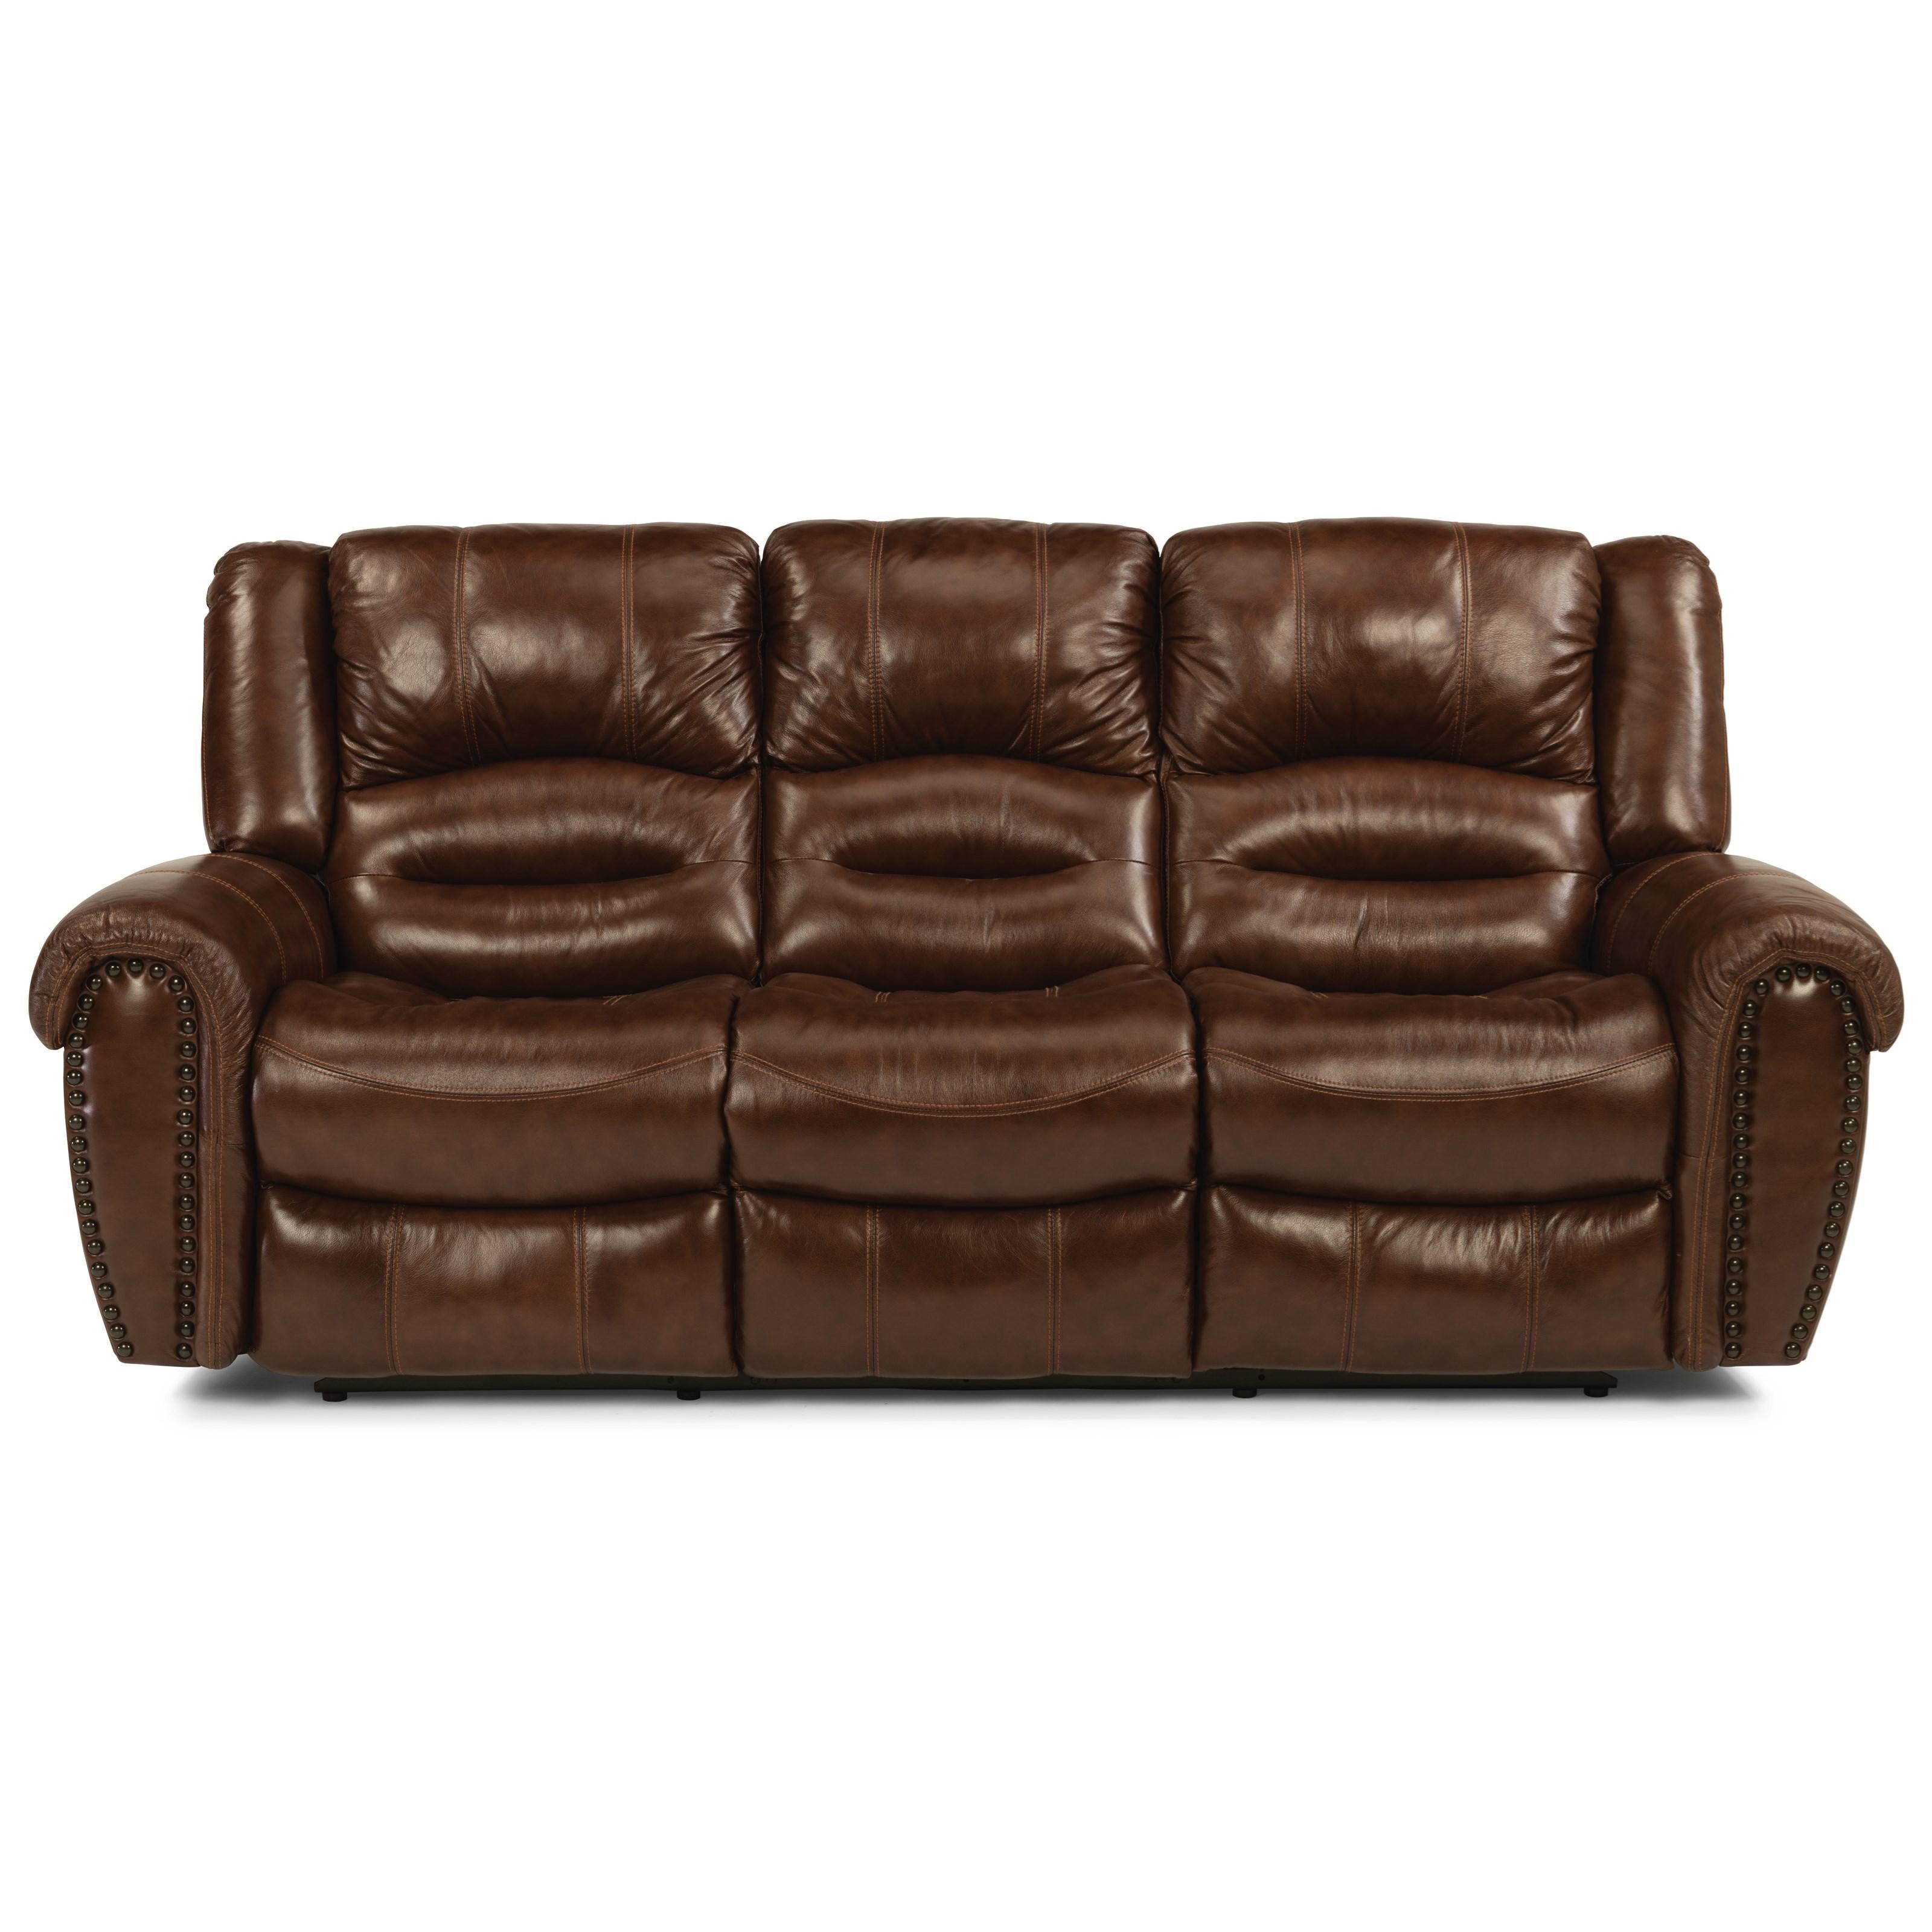 Latitudes - Town Reclining Sofa by Flexsteel at Walker's Furniture